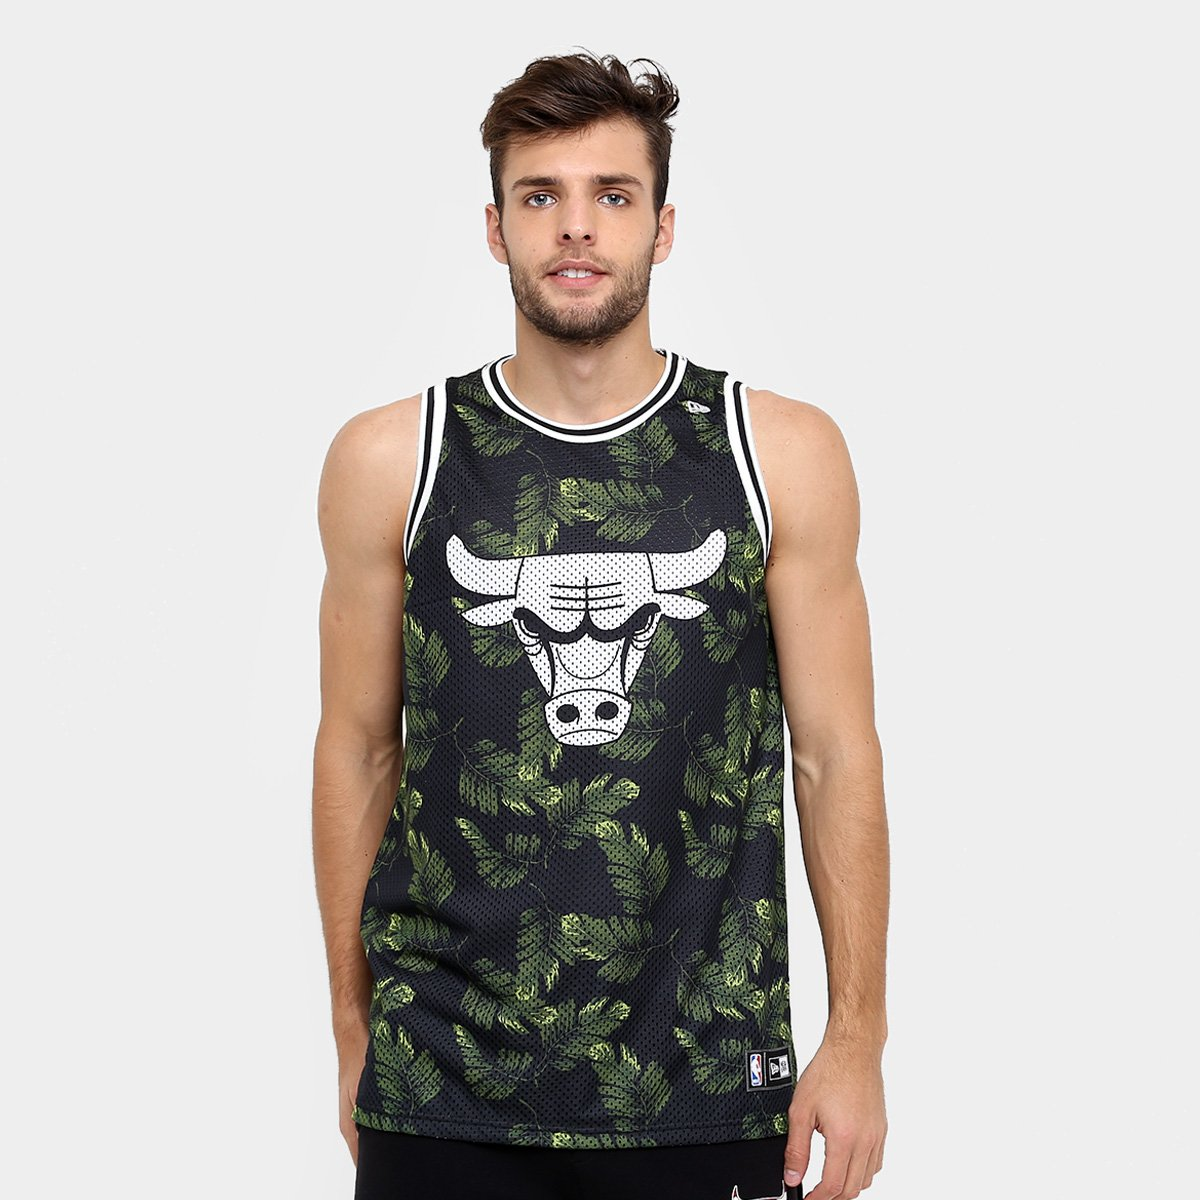 Camiseta Regata New Era NBA Jersey Palm Camo Chicago Bulls - Compre Agora  eb67625ad54